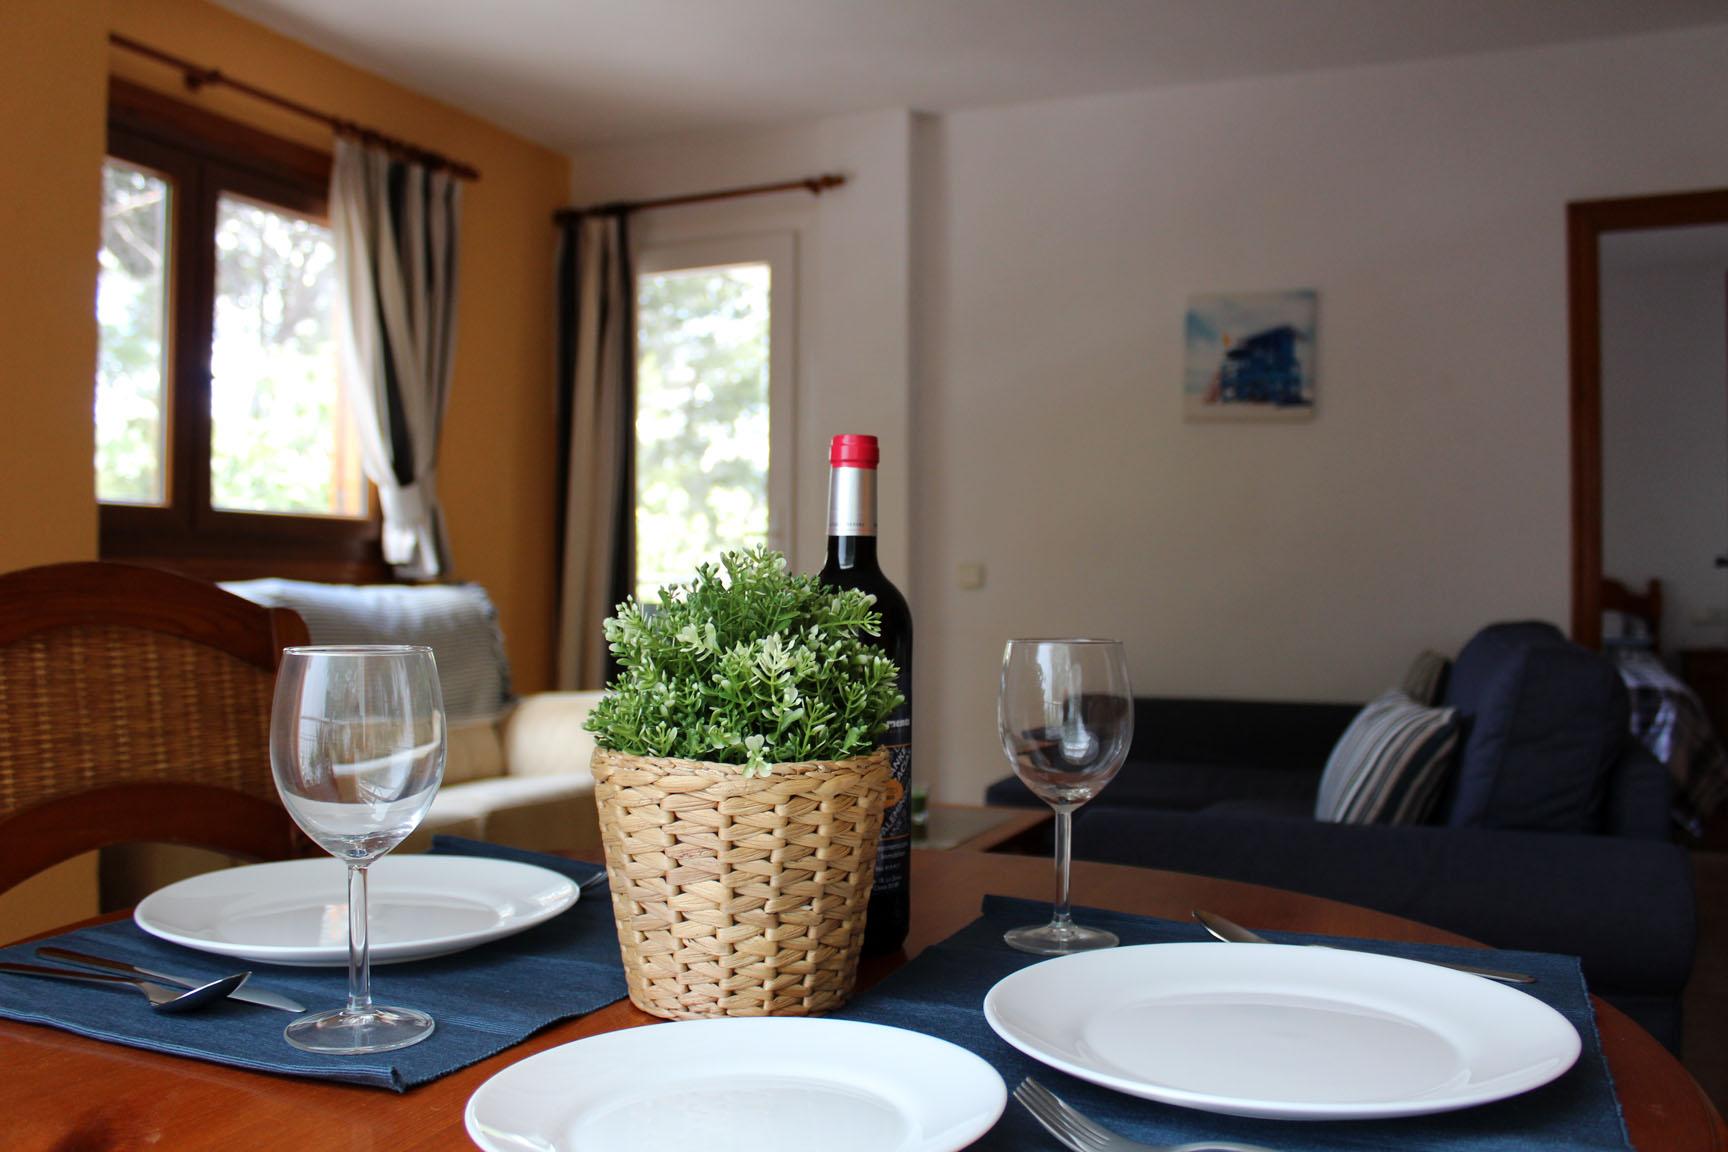 ITSH Property Spacious 1 bed apartment Villamartin Plaza 1